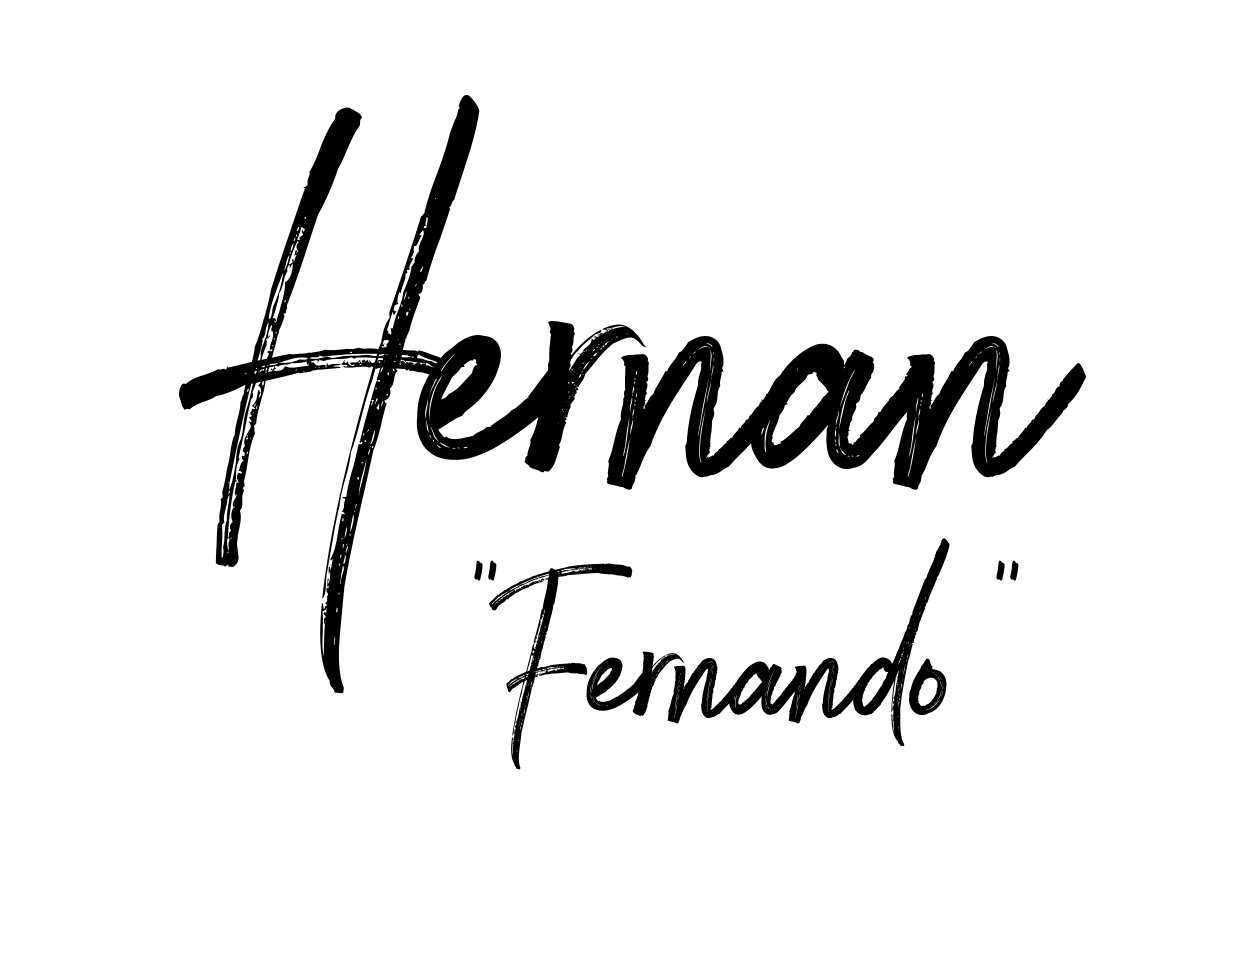 Hernan.png